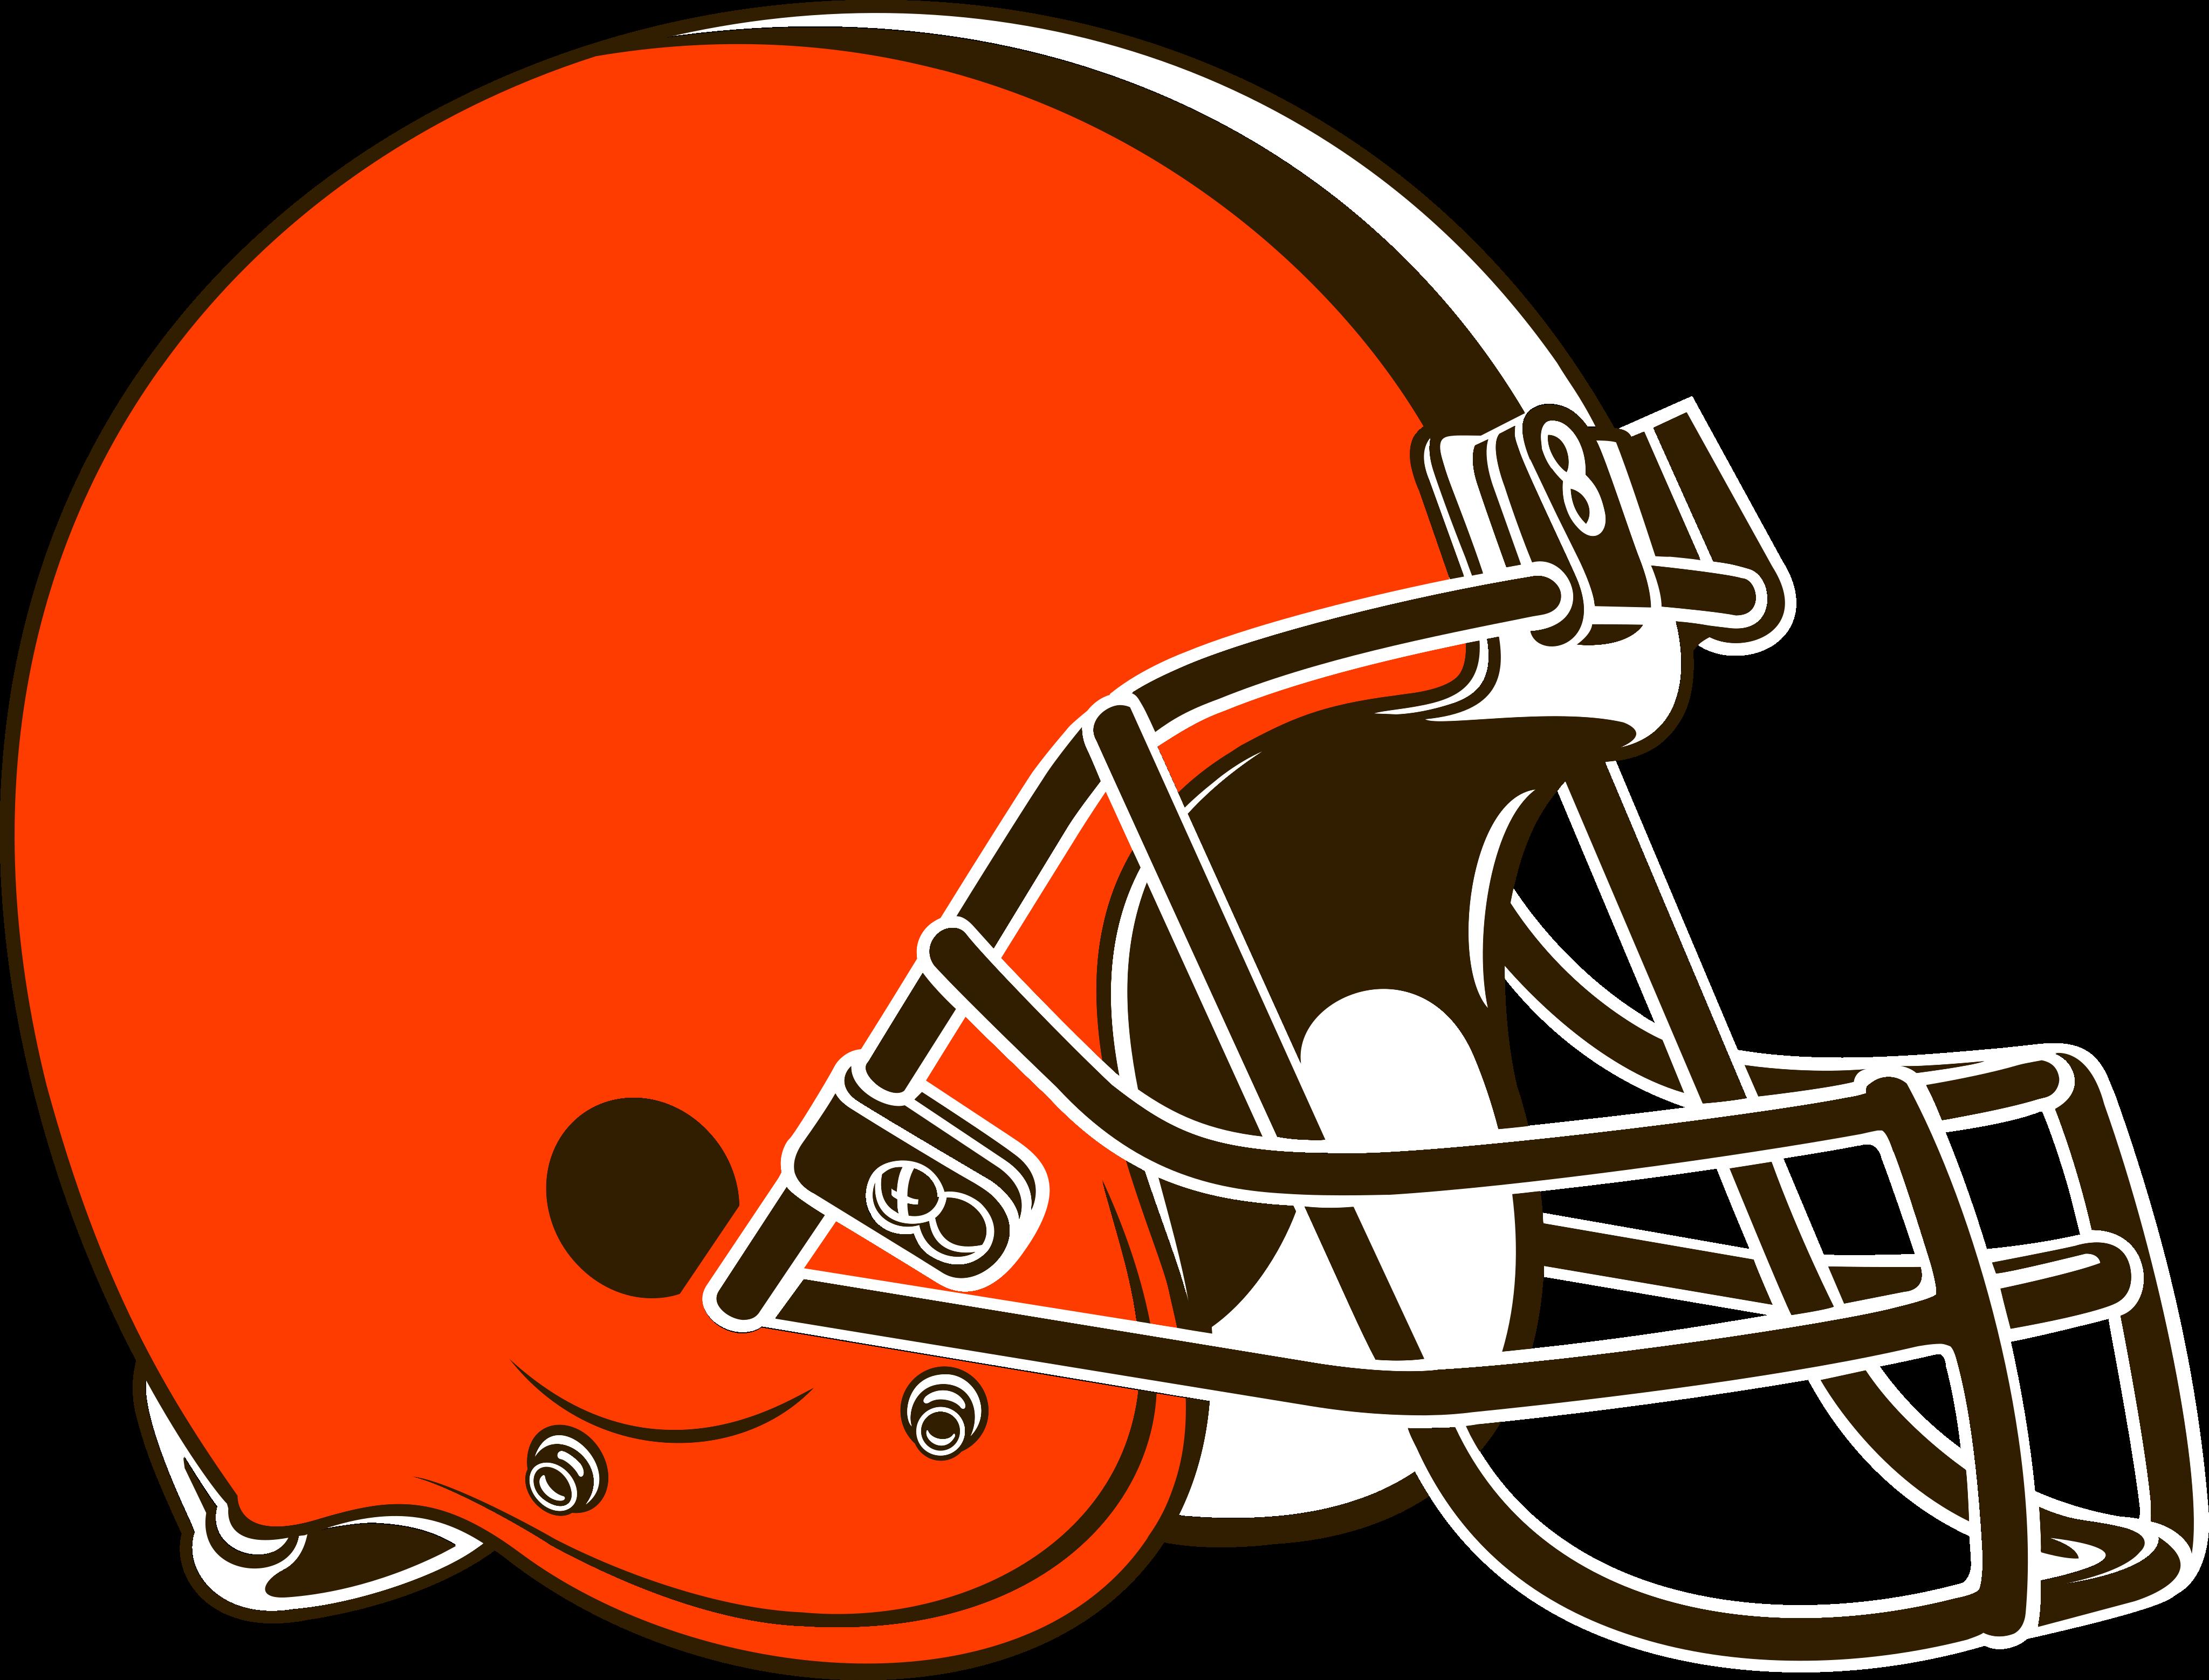 cleveland browns logo 2 - Cleveland Browns Logo